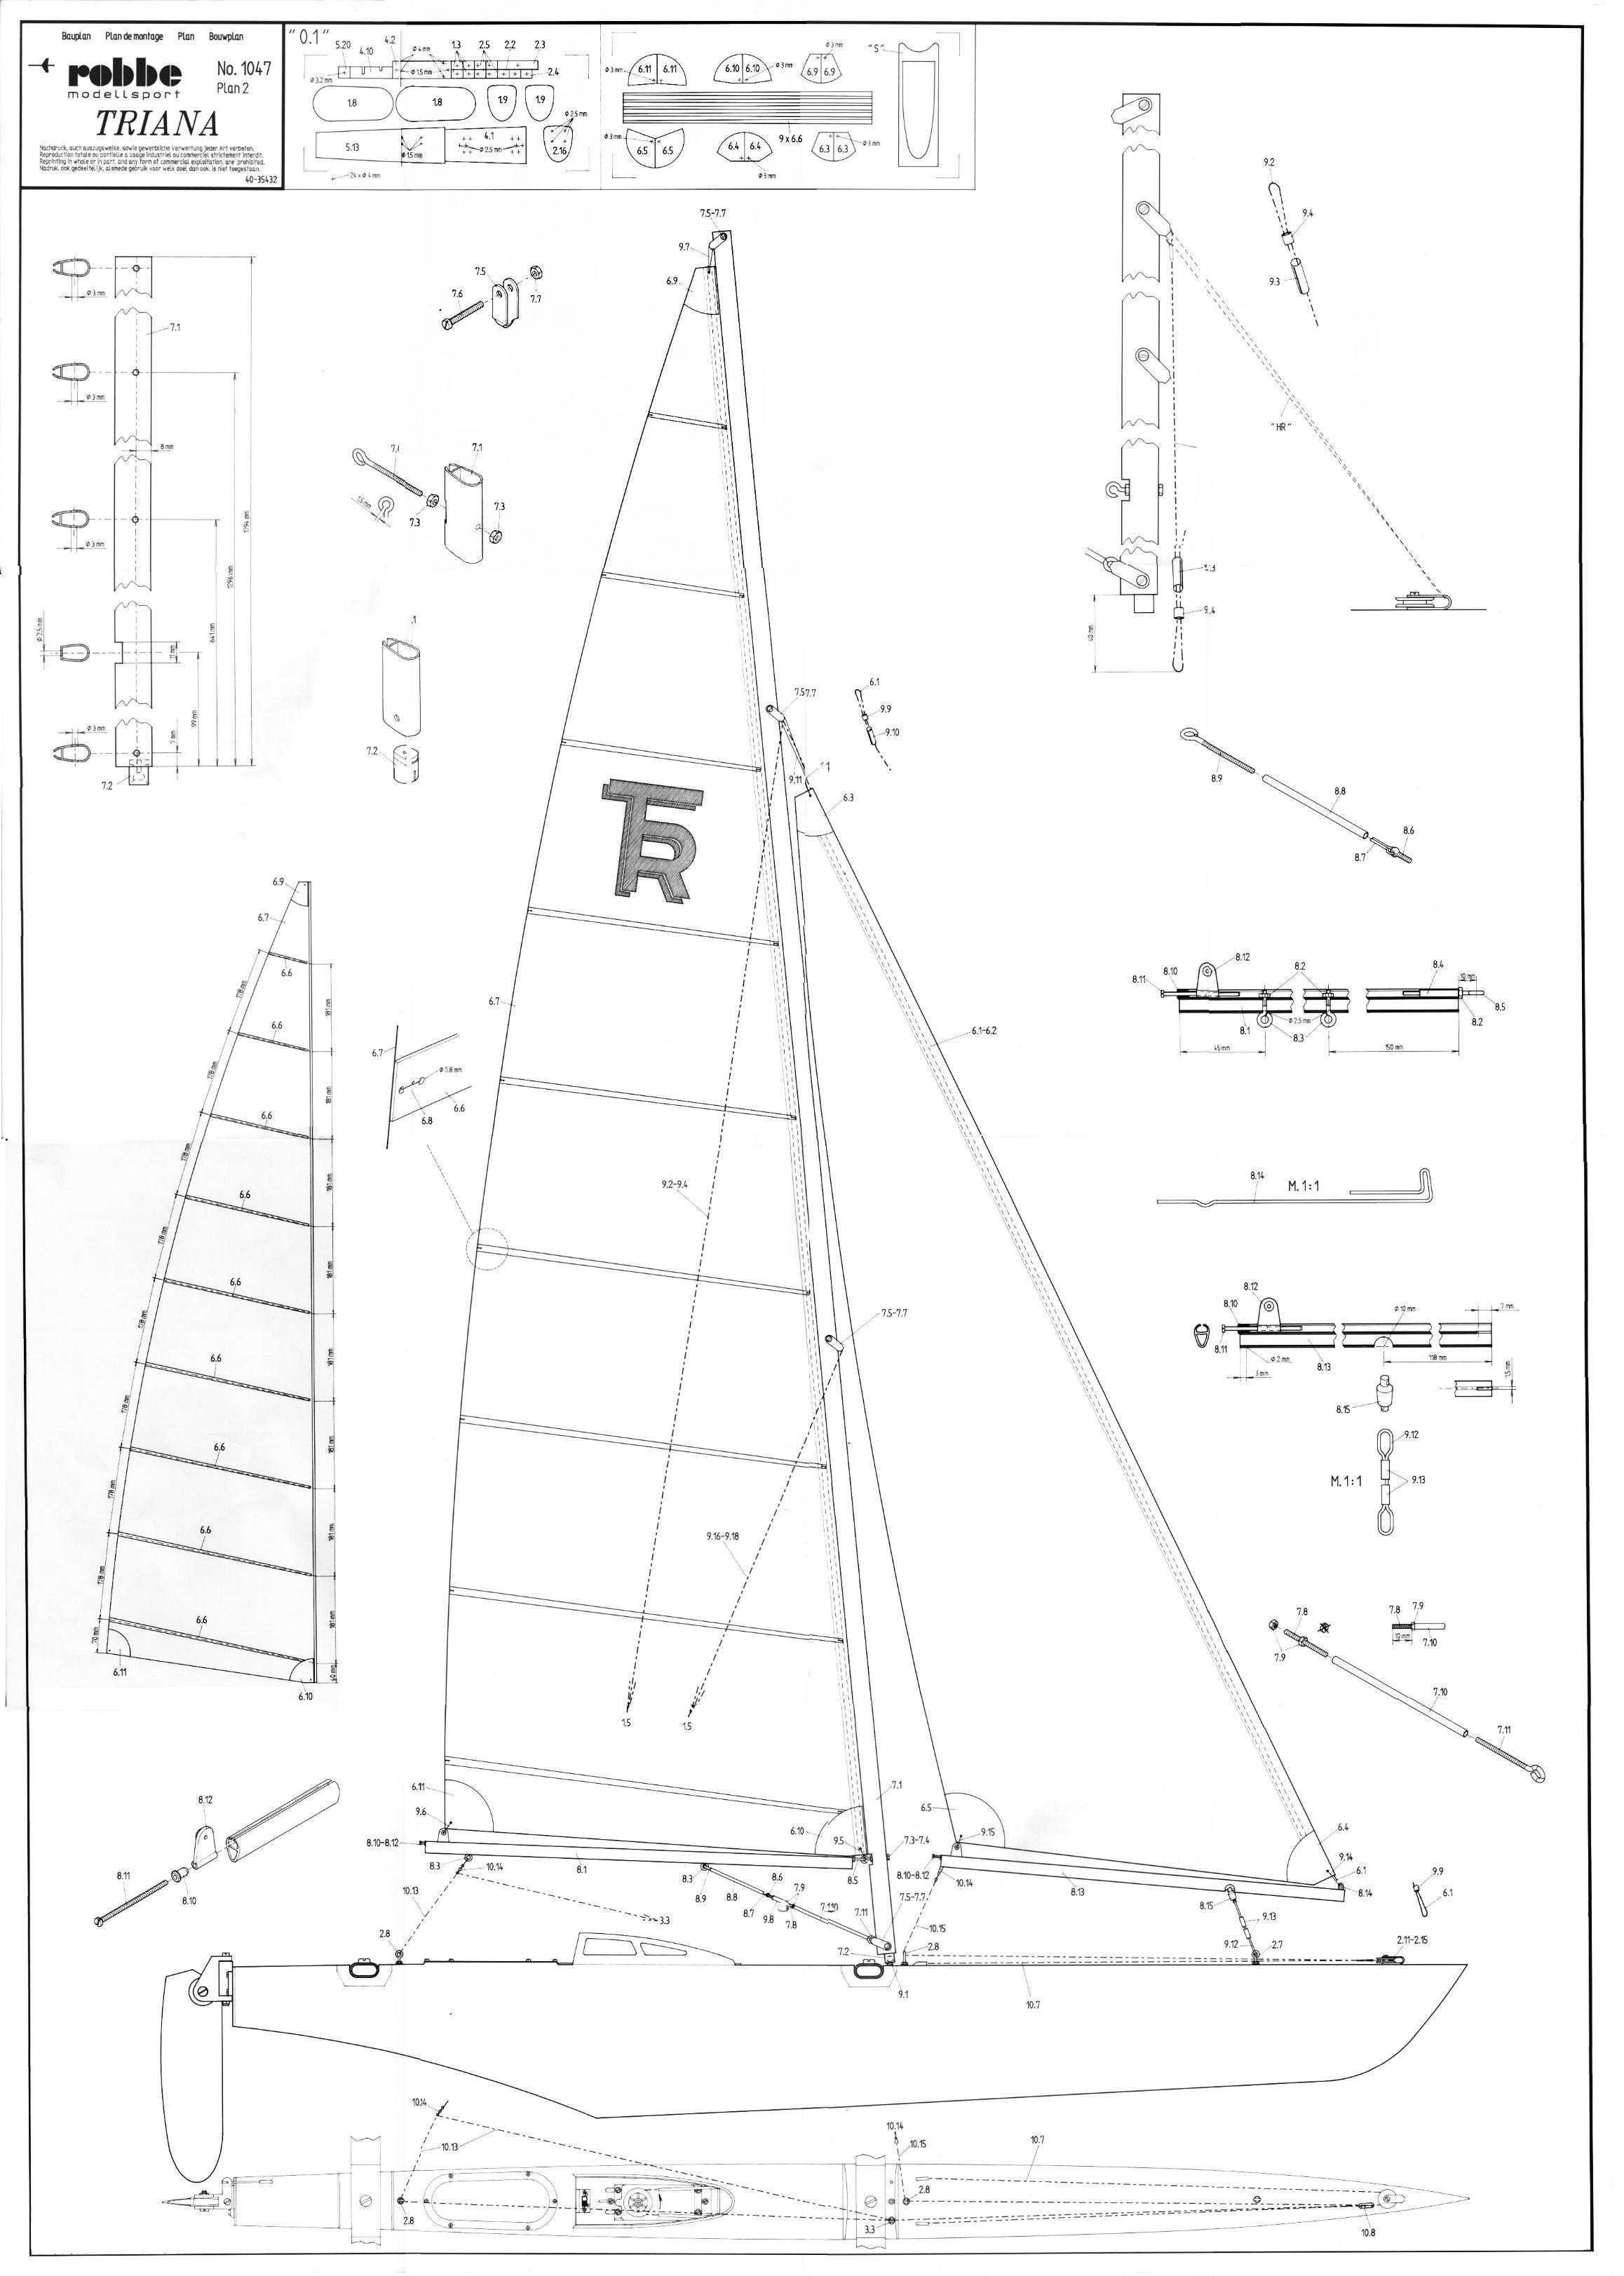 iwema enterprise the power of rc multi hull sailing plans triana hunter sailboat diagram power sailboat diagram [ 2316 x 3246 Pixel ]